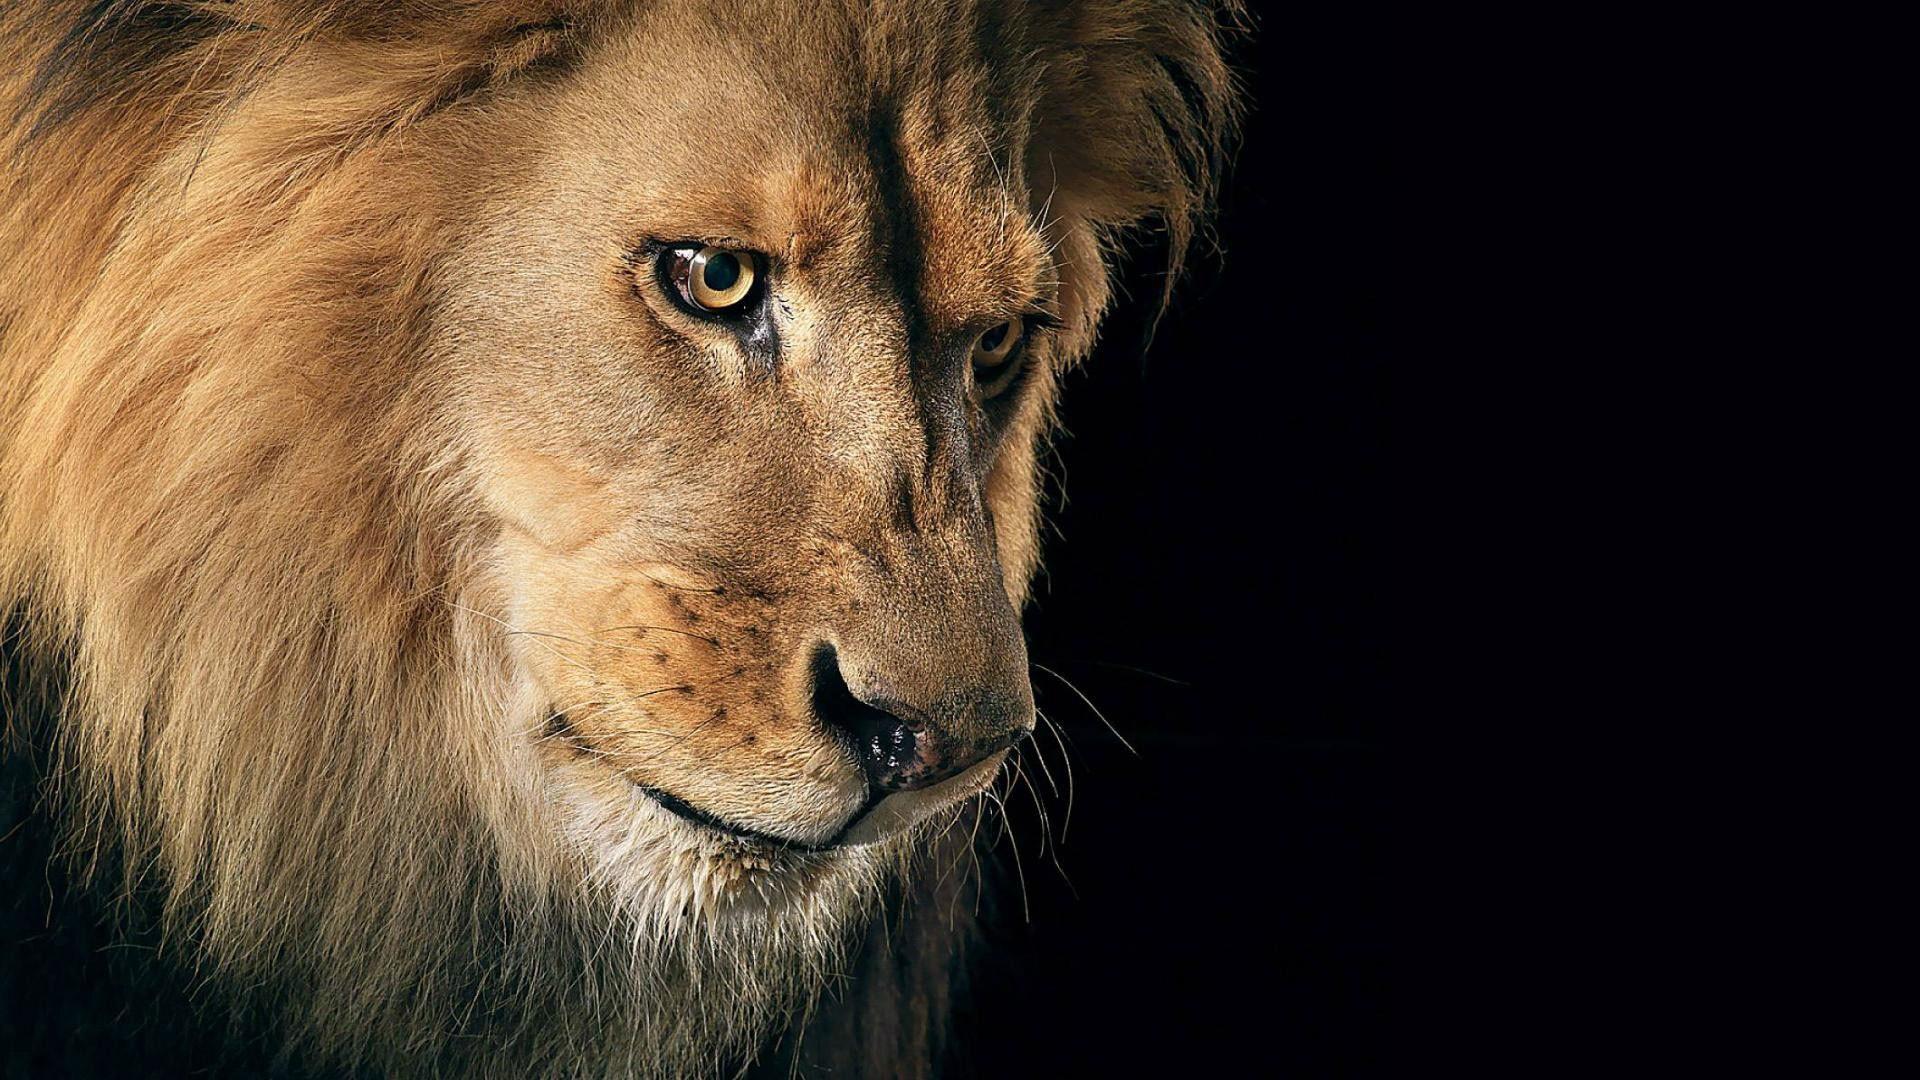 hd pics photos best beautiful lion face close up attractive hd quality  desktop background wallpaper